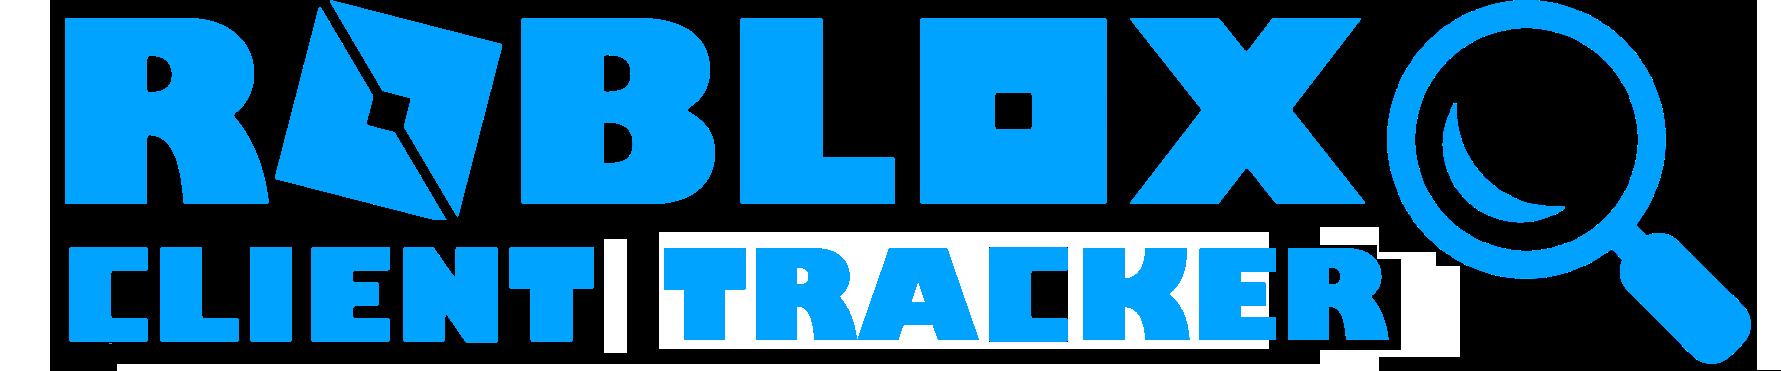 GitHub - CloneTrooper1019/Roblox-Client-Tracker: An